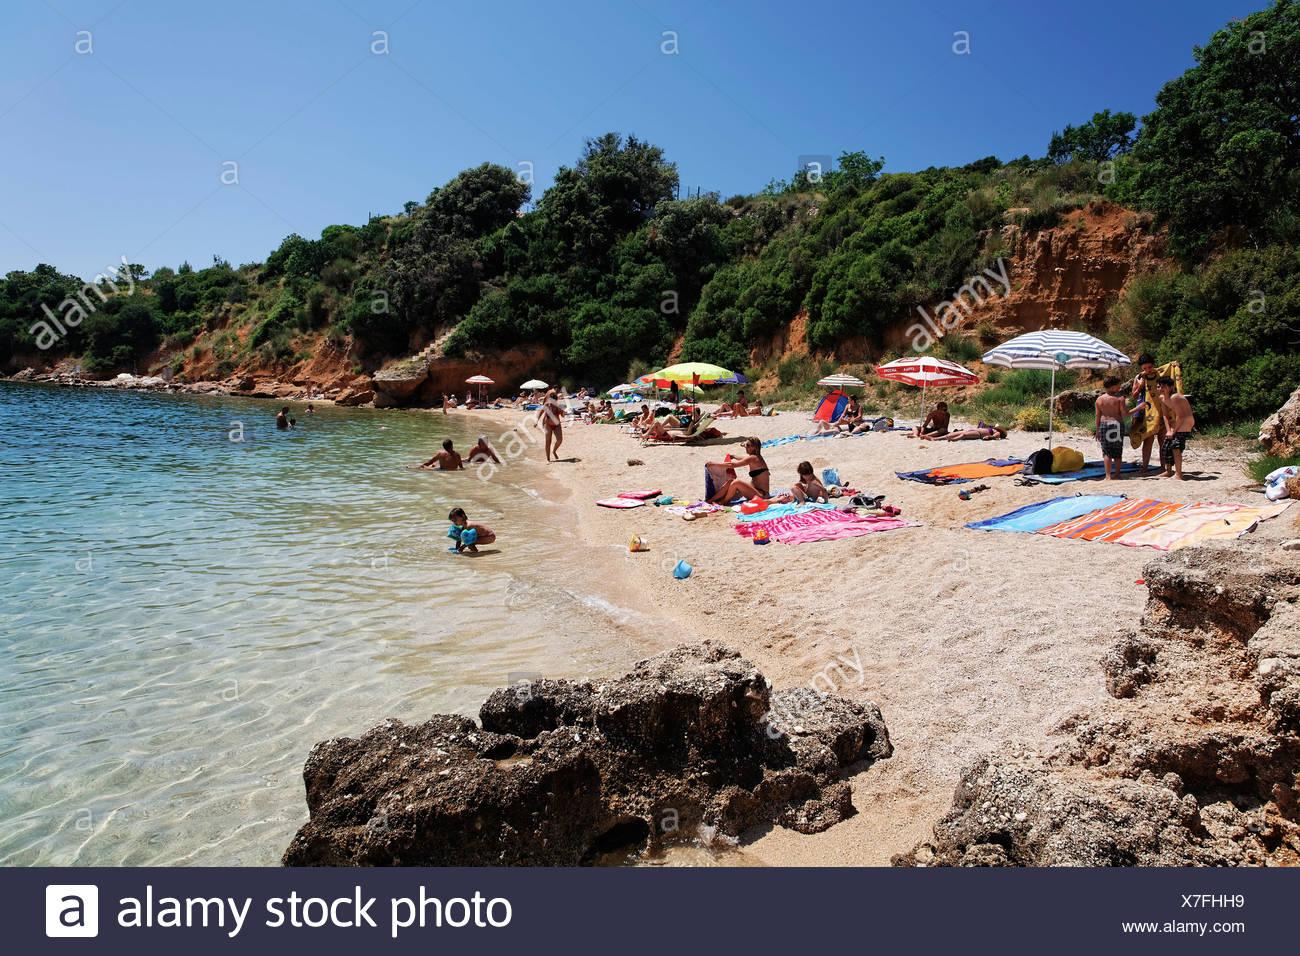 croatia island rab online tourist guide kristofor - 860×484